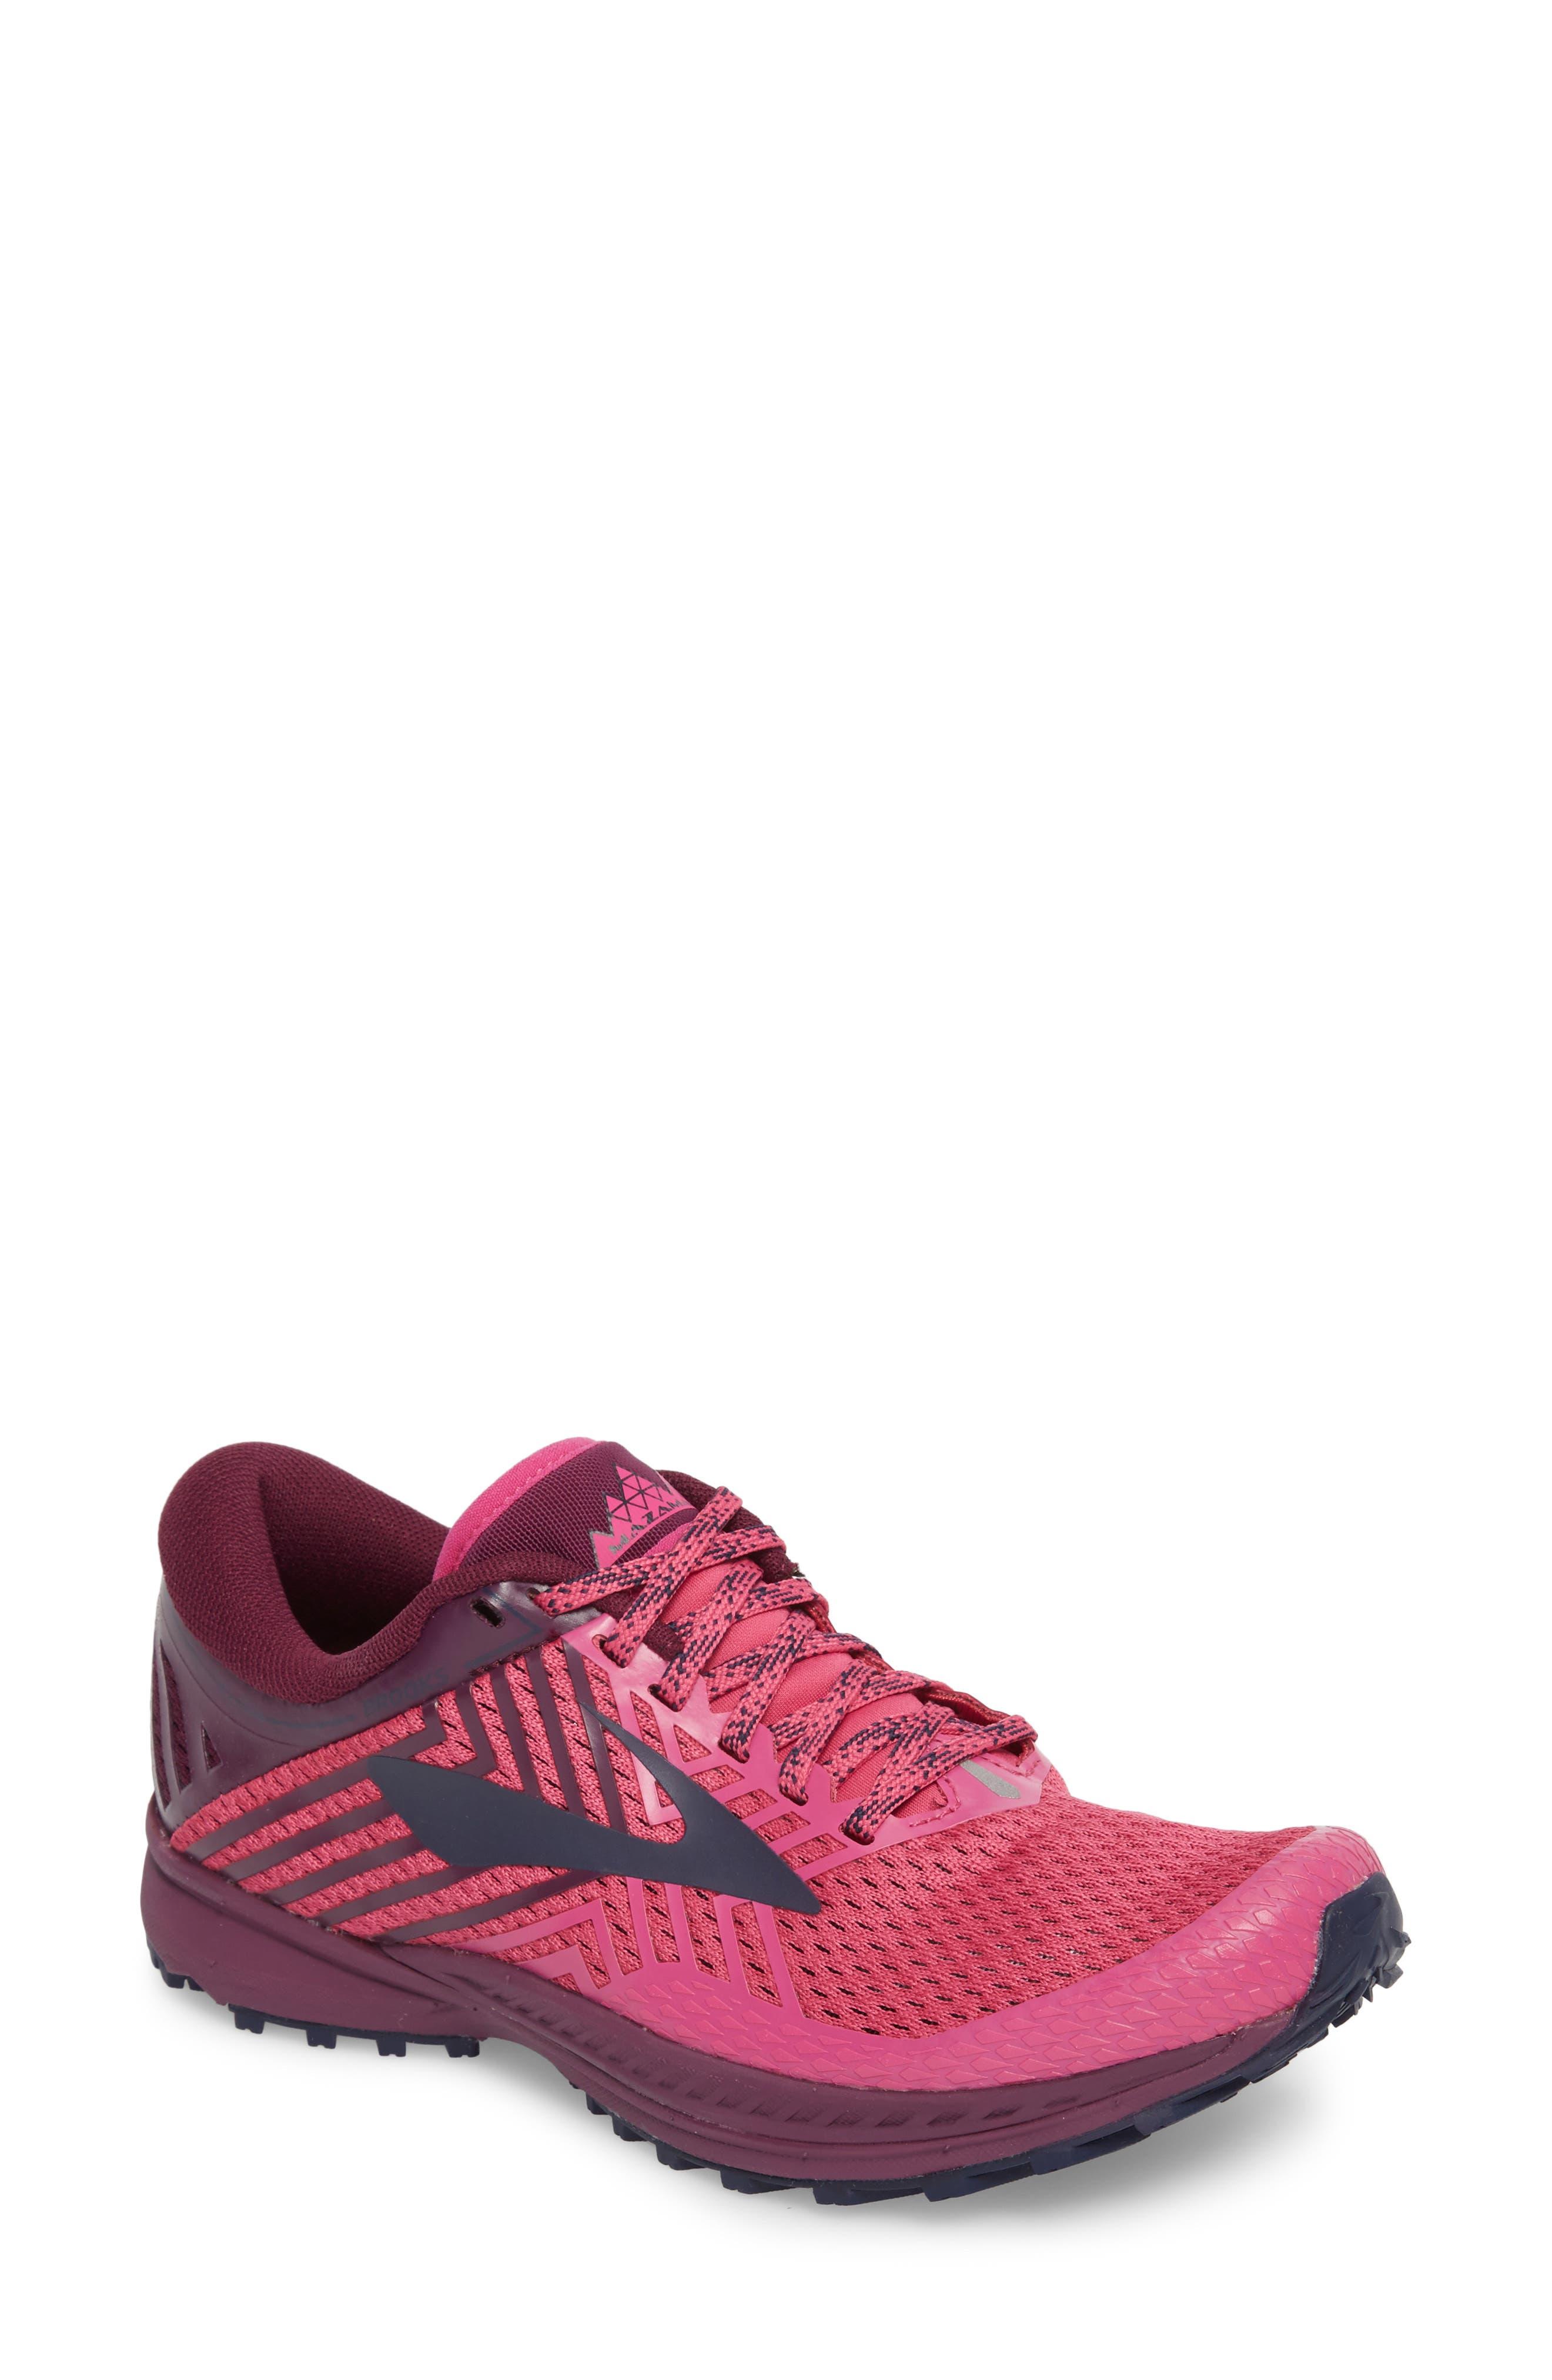 Mazama 2 Trail Running Shoe,                             Main thumbnail 1, color,                             PINK/ PLUM/ NAVY